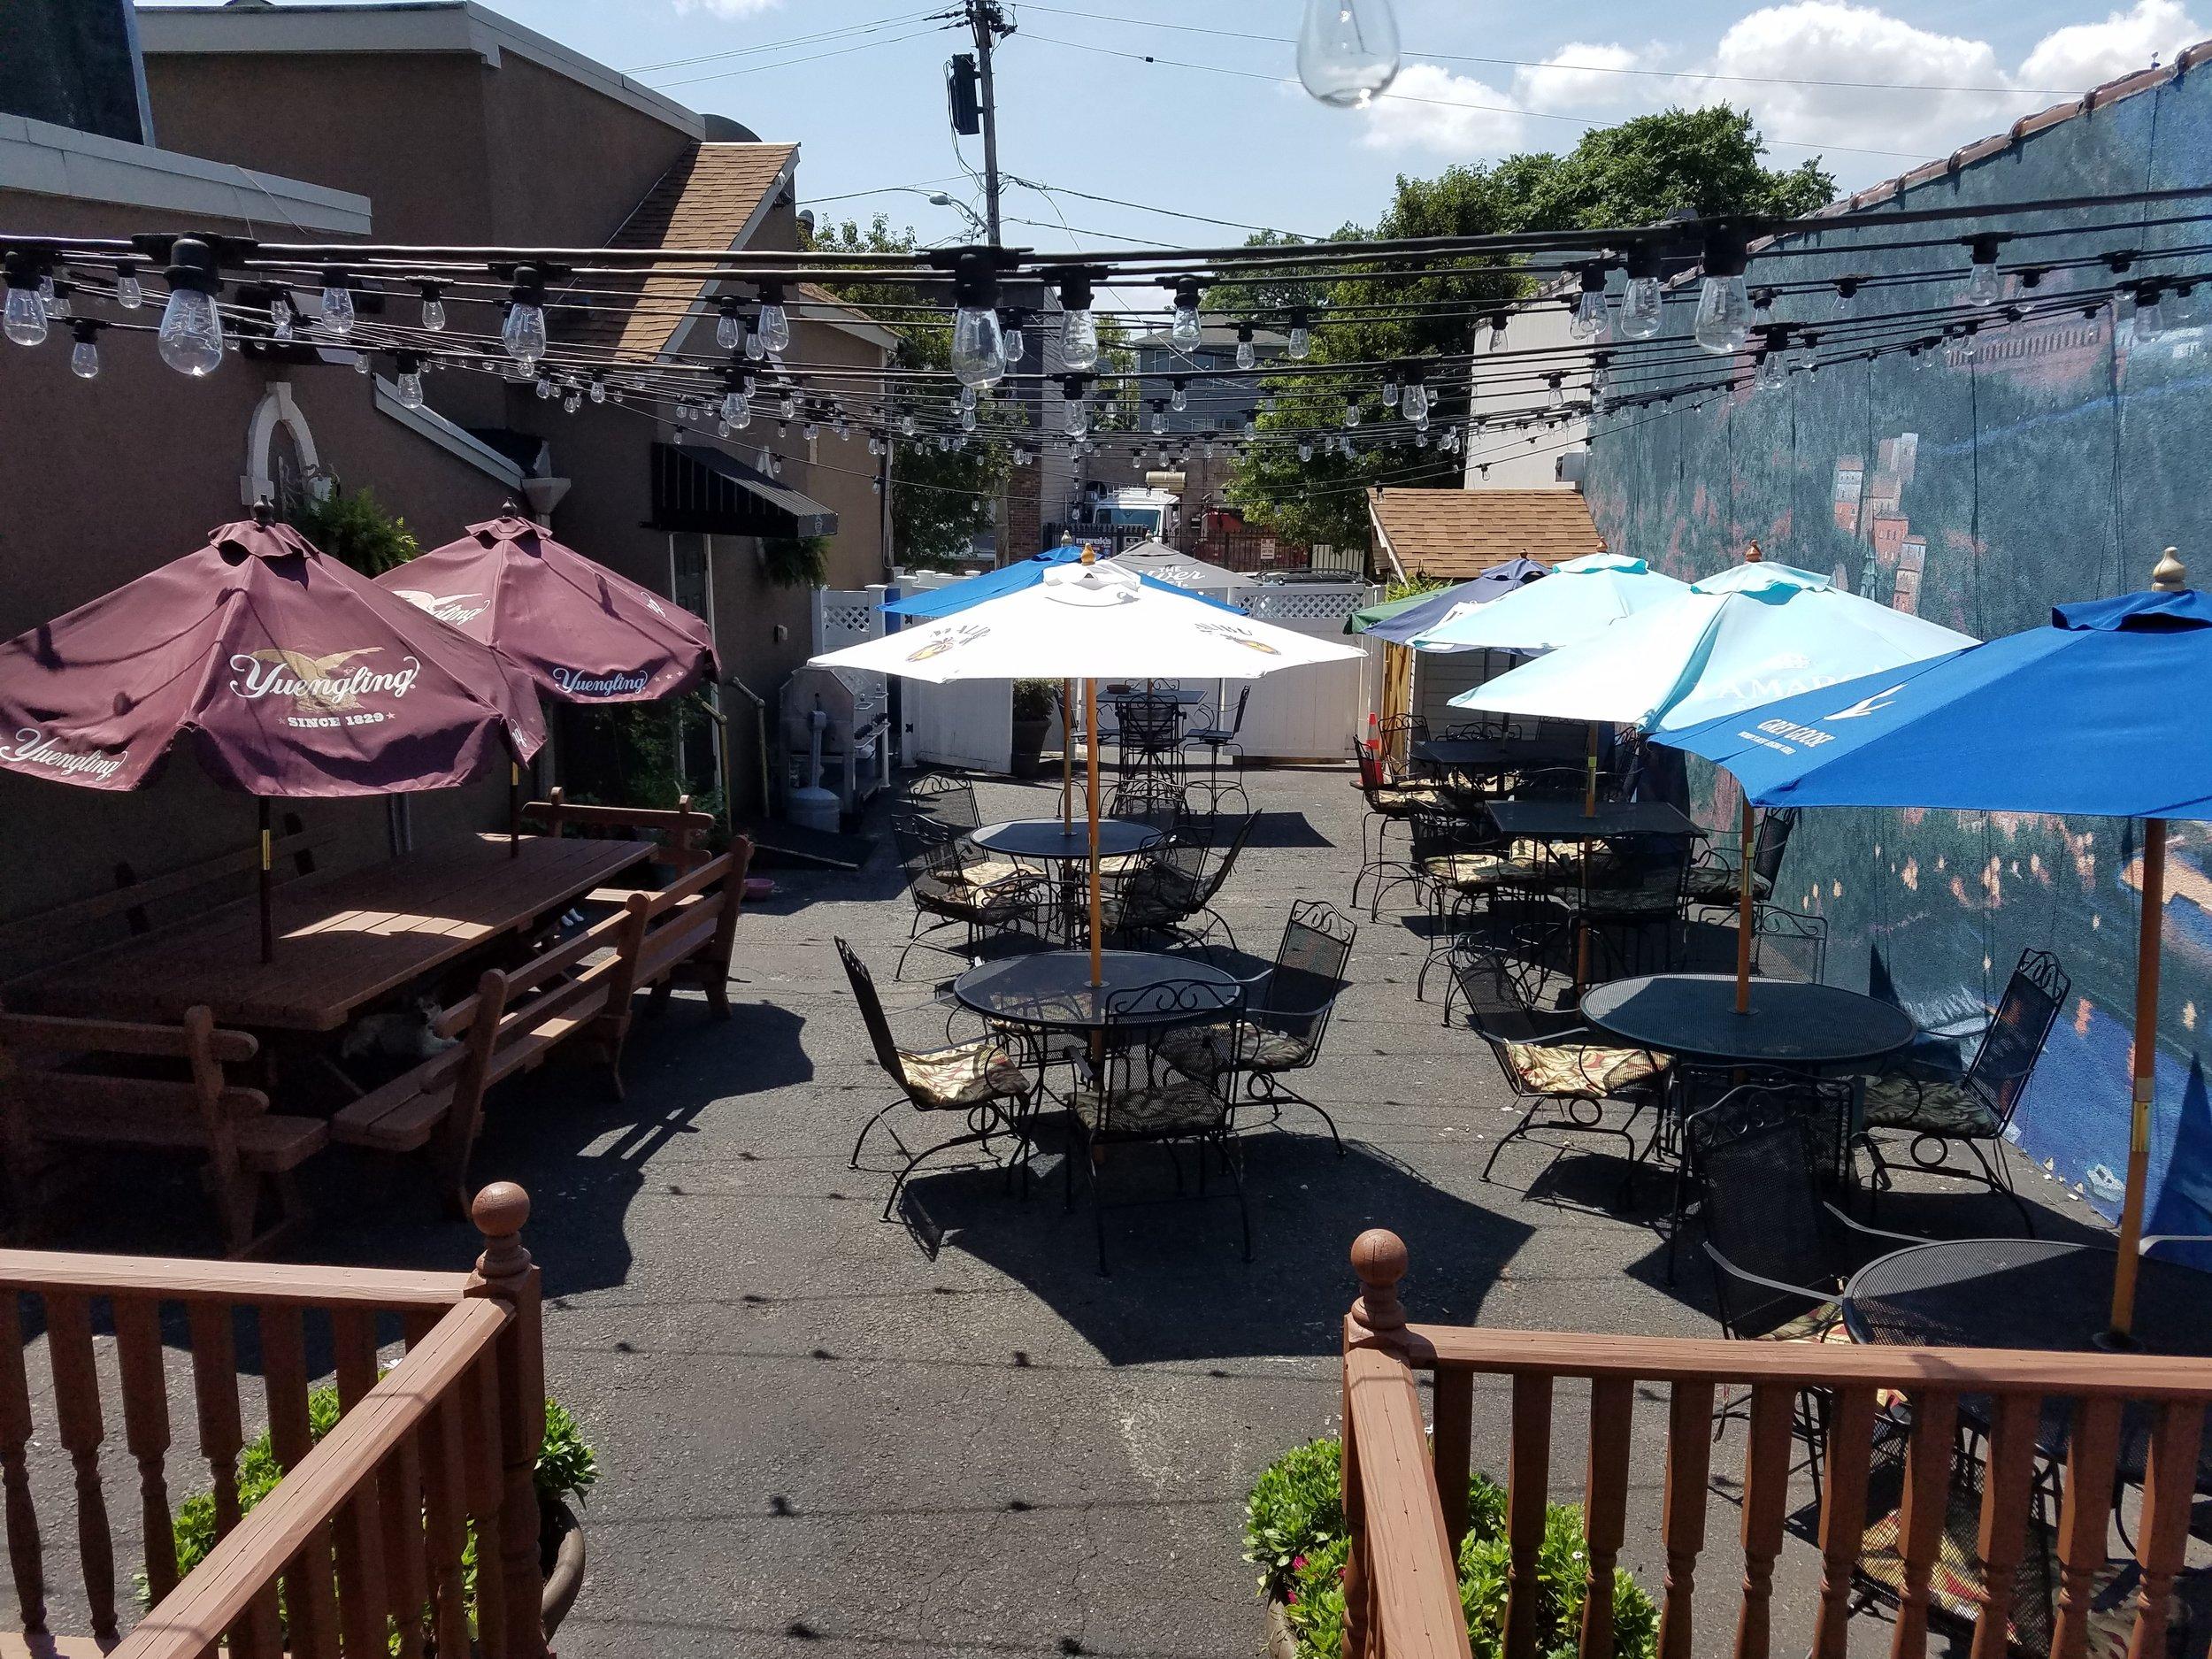 bayonne patio bar grille